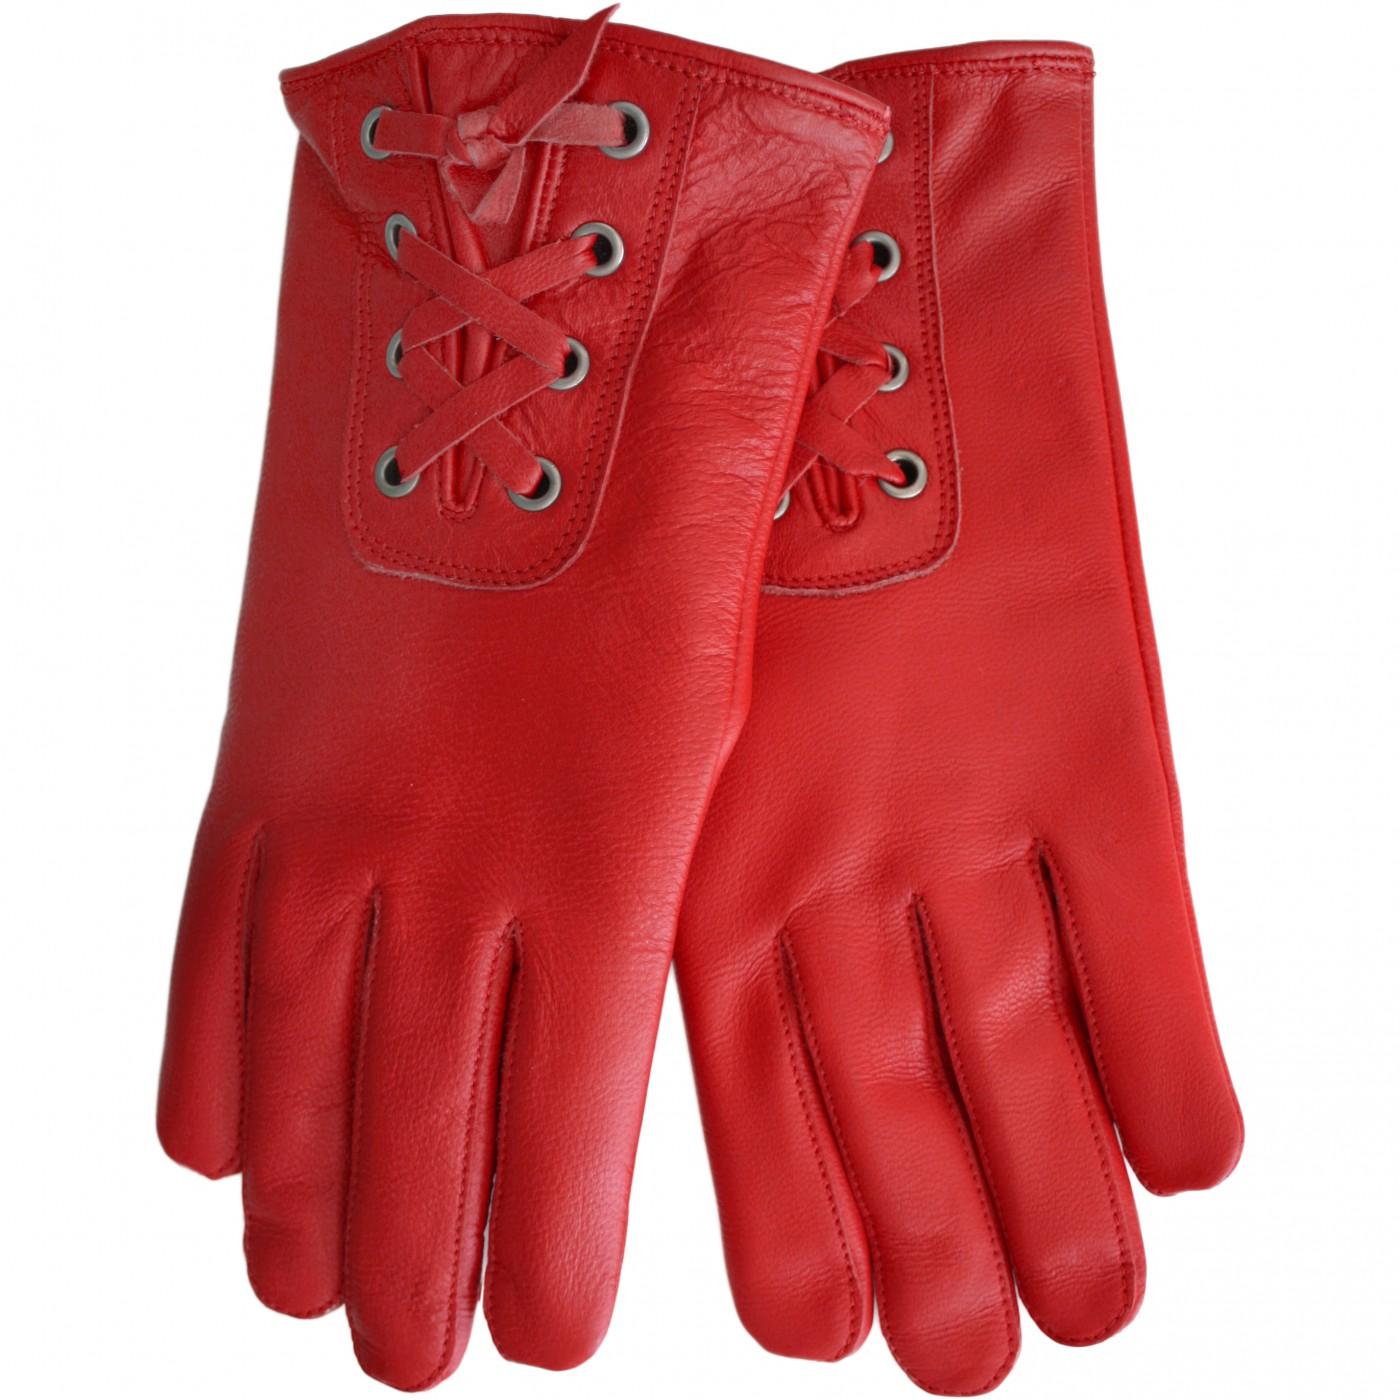 Damen Lederhandschuhe Handschuhe Lammnappa echtleder Lamm-Nappaleder rot